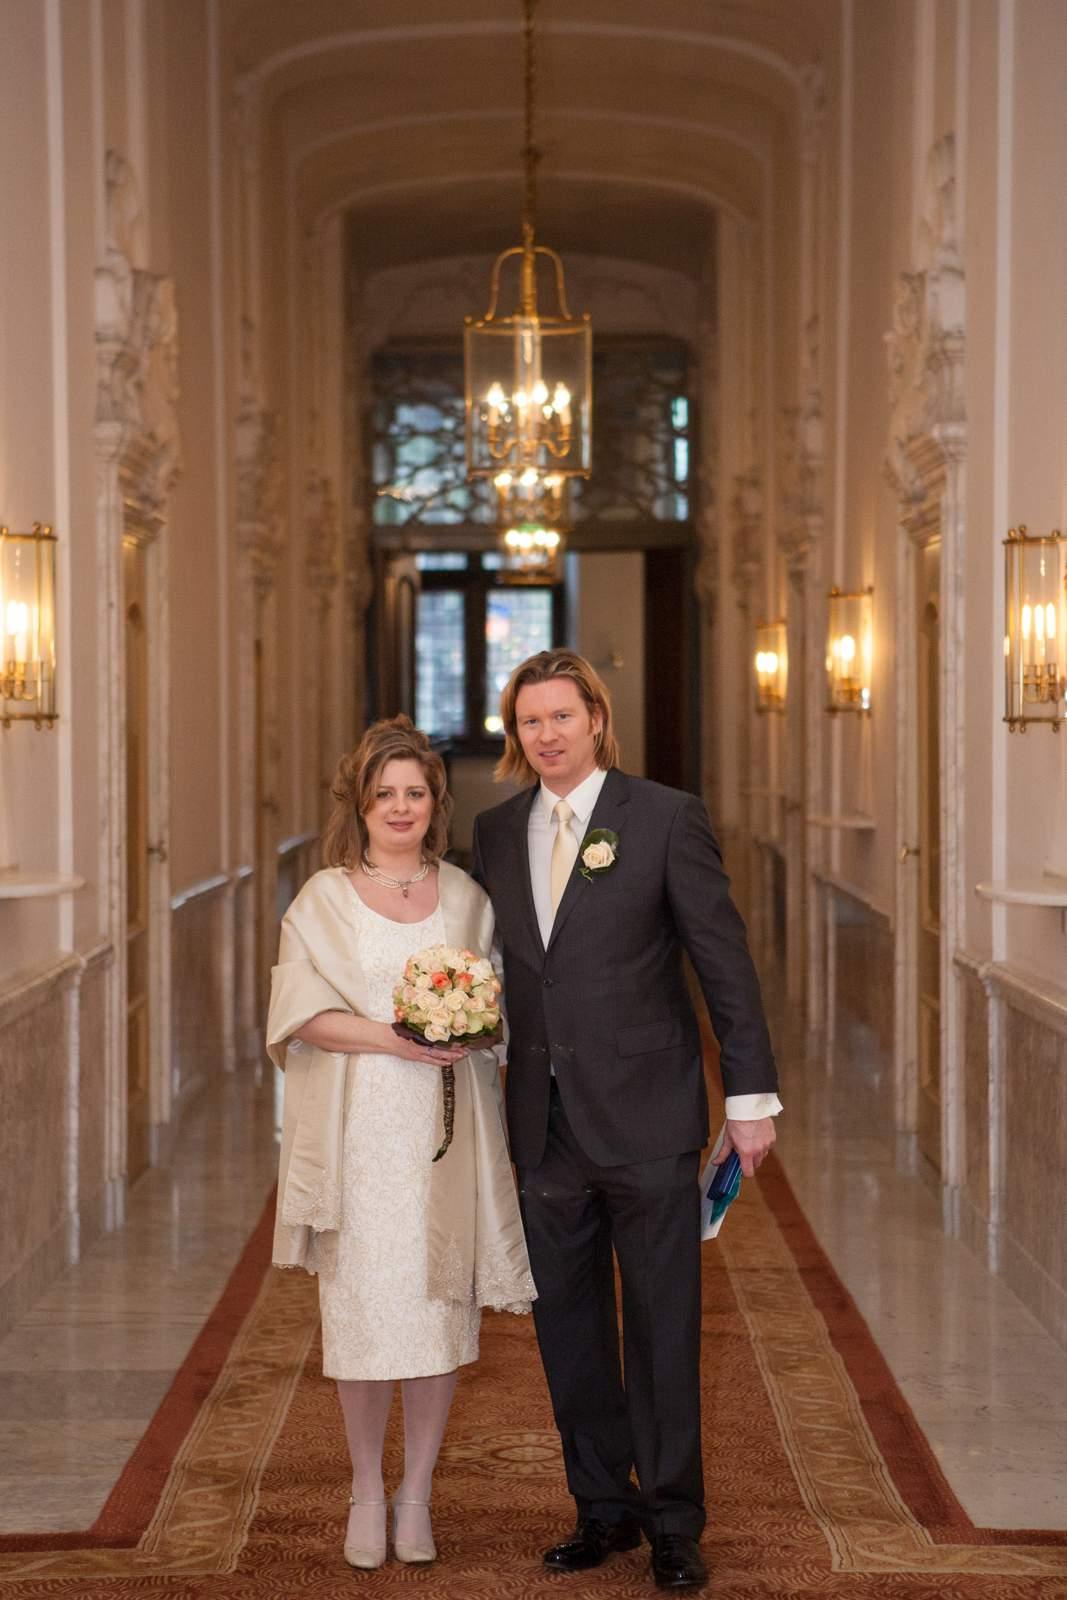 Wedding photography by The Hagu  e, Mexico, United States, portrait, wedding, family, maternity, and lifestyle photographer Al Borrelli